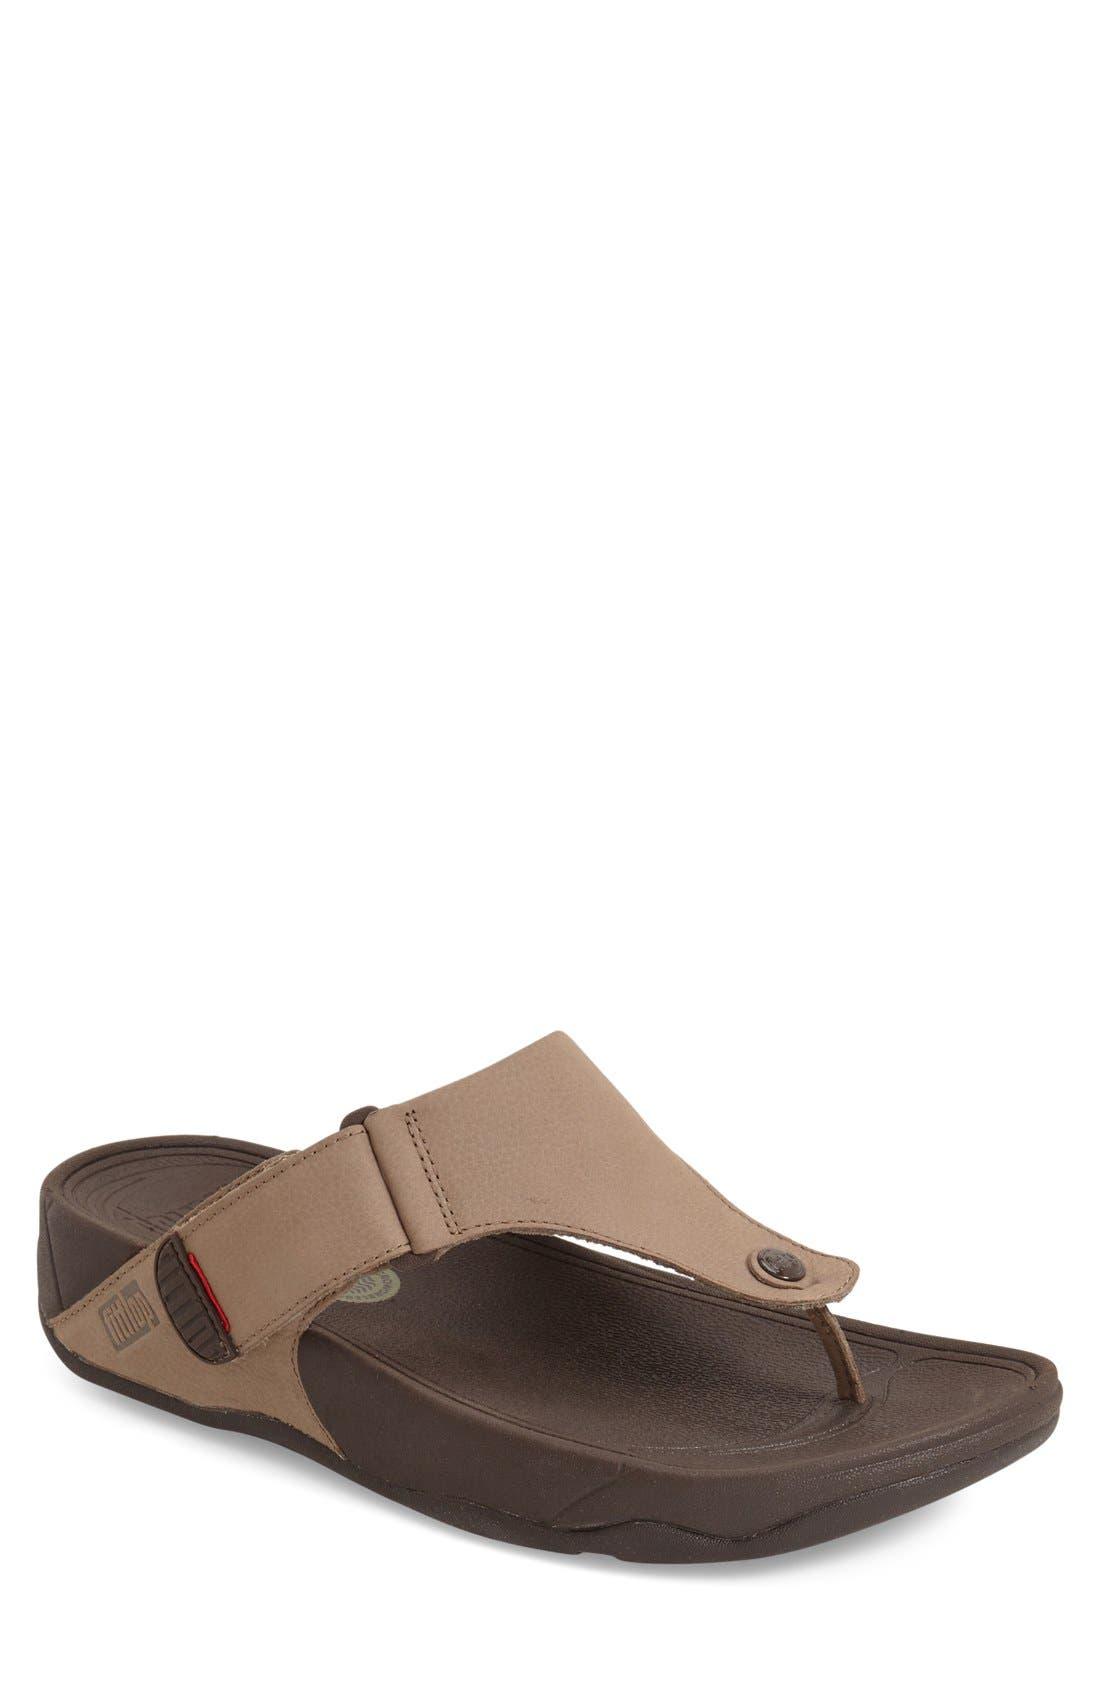 Trakk<sup>™</sup> II Sandal,                         Main,                         color, Timberwolf Nubuck